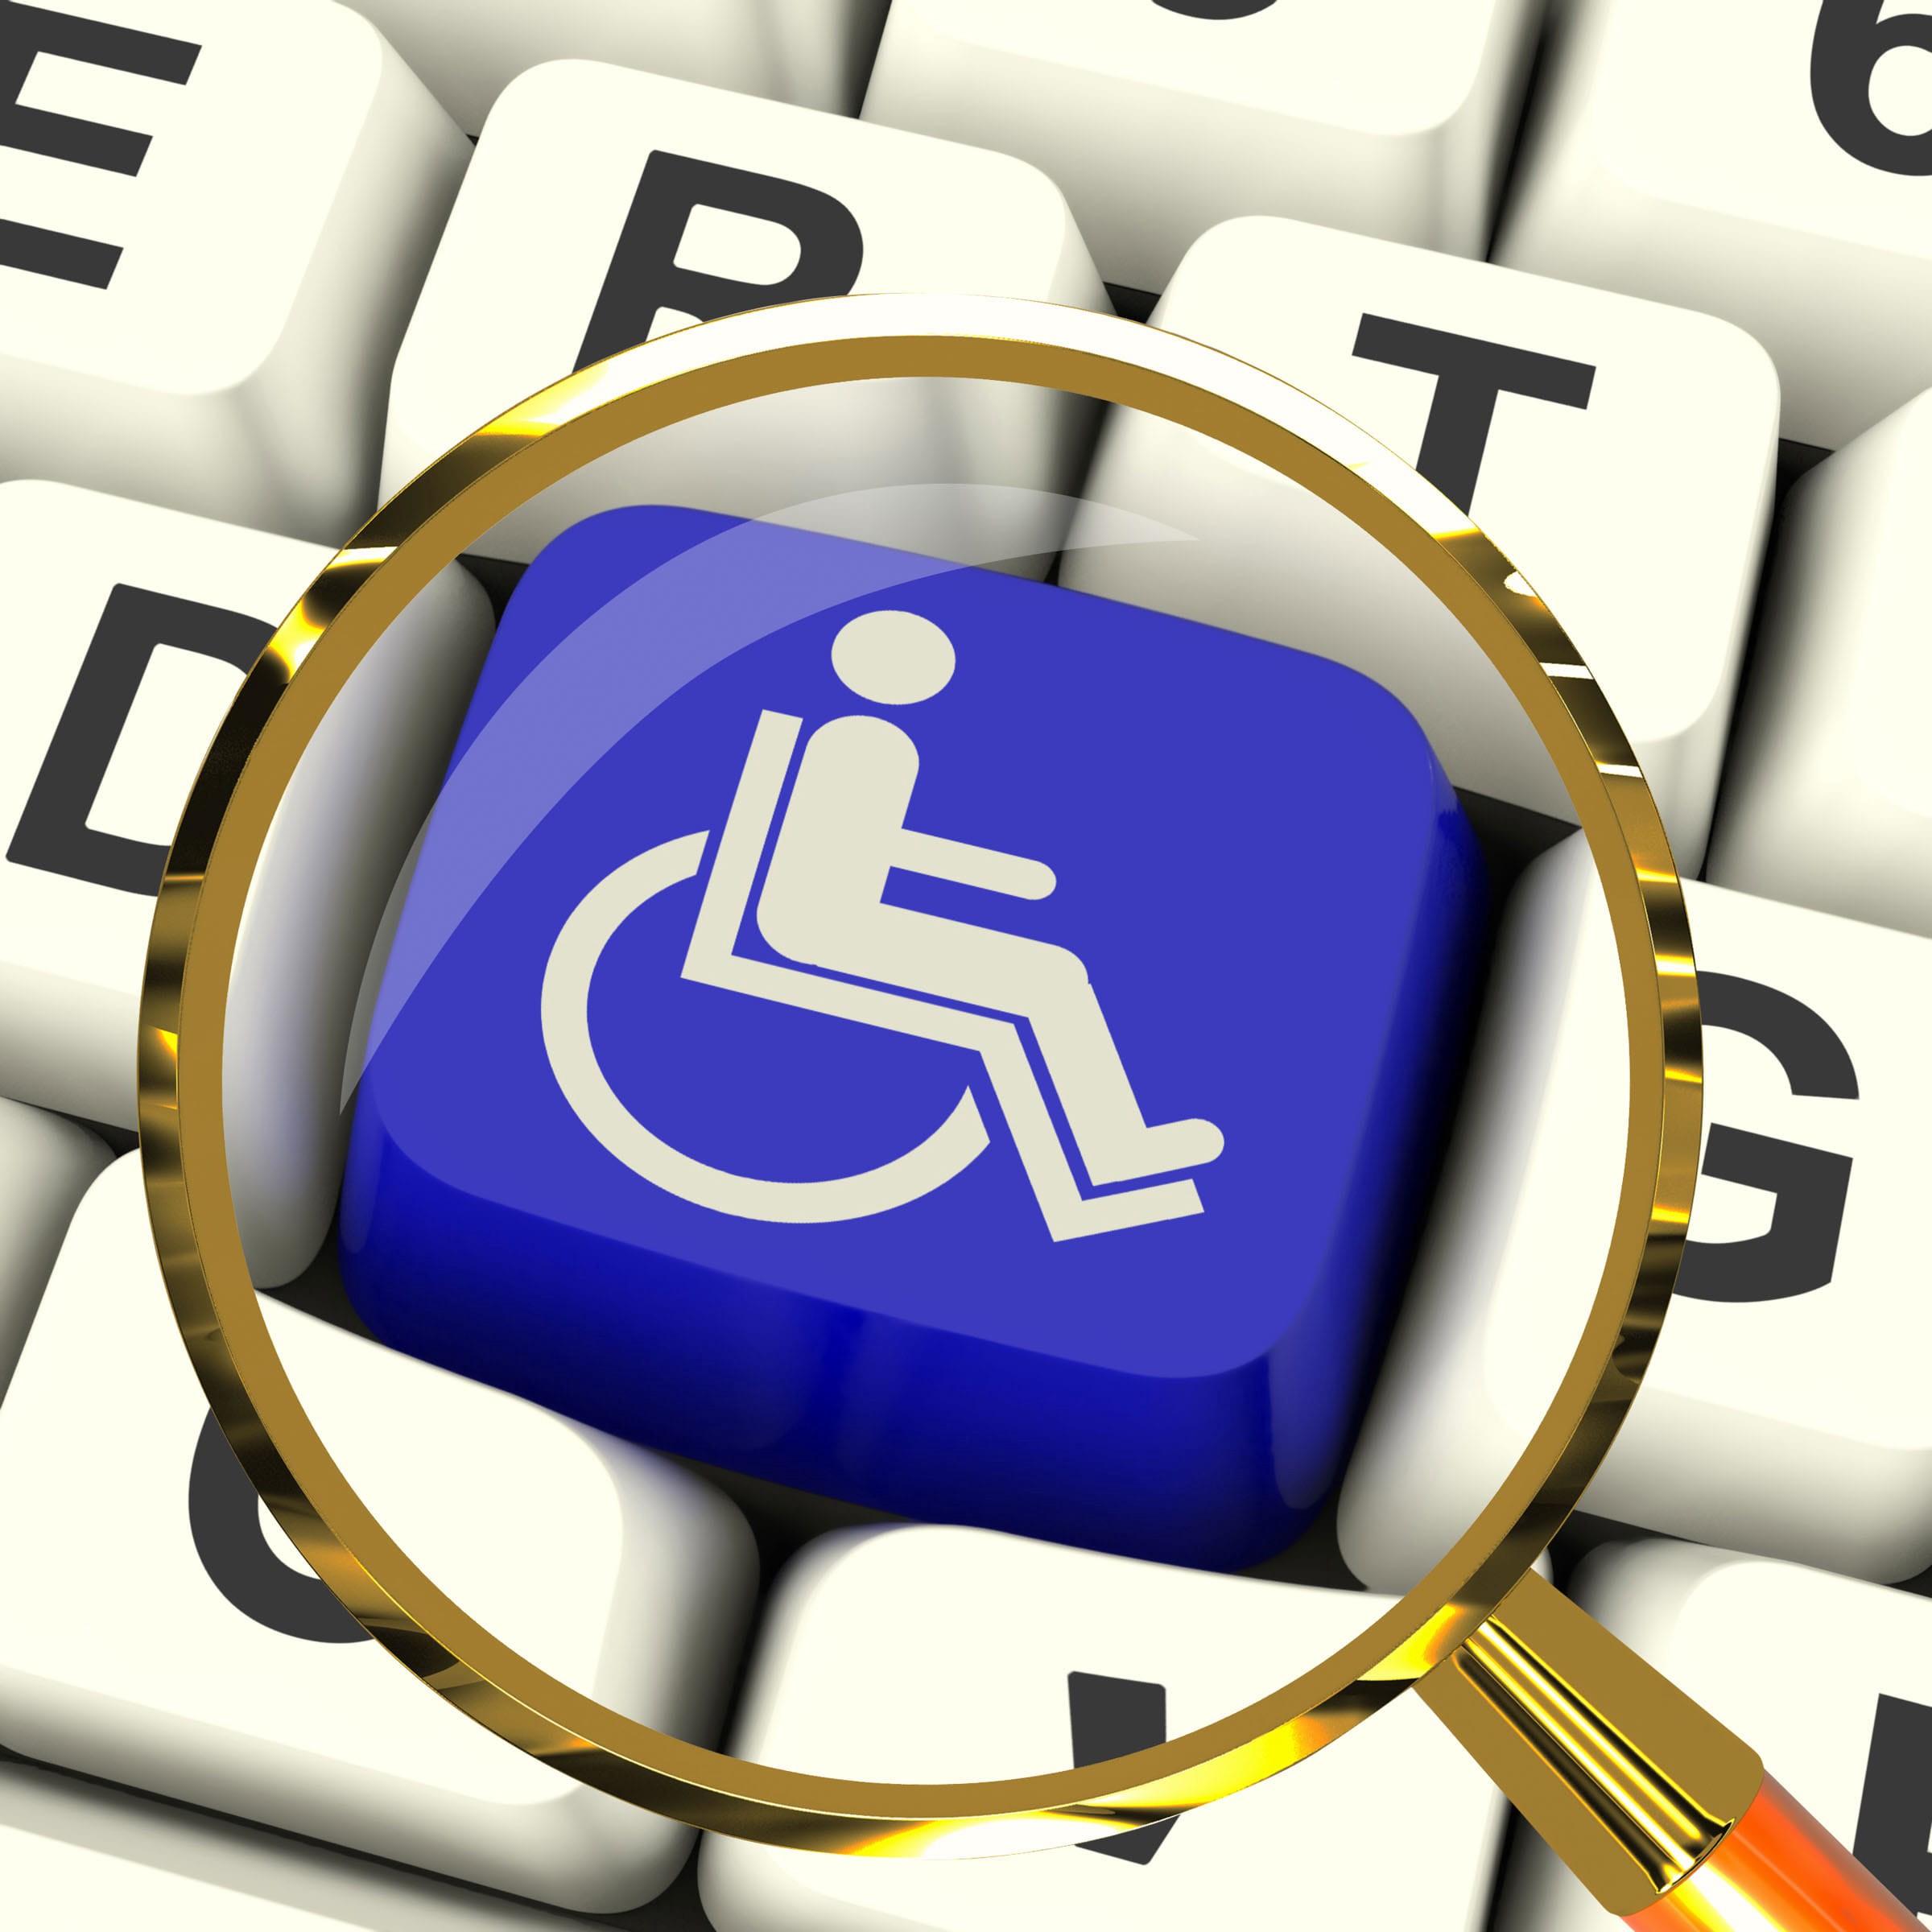 Accessibility Symbol